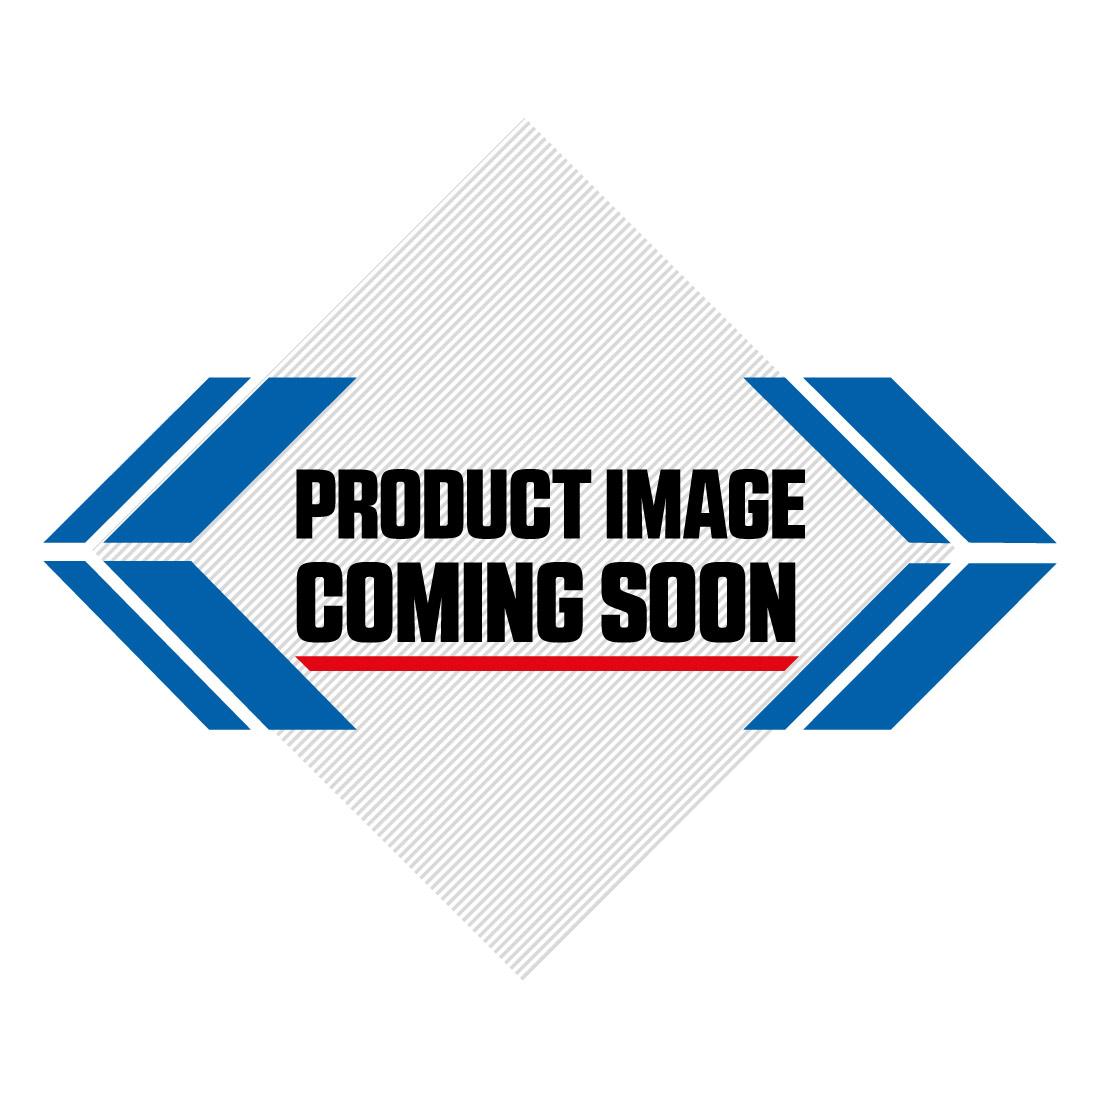 Suzuki Restyled Plastic Kit Suzuki RM 85 (00-17) Black Image-1>